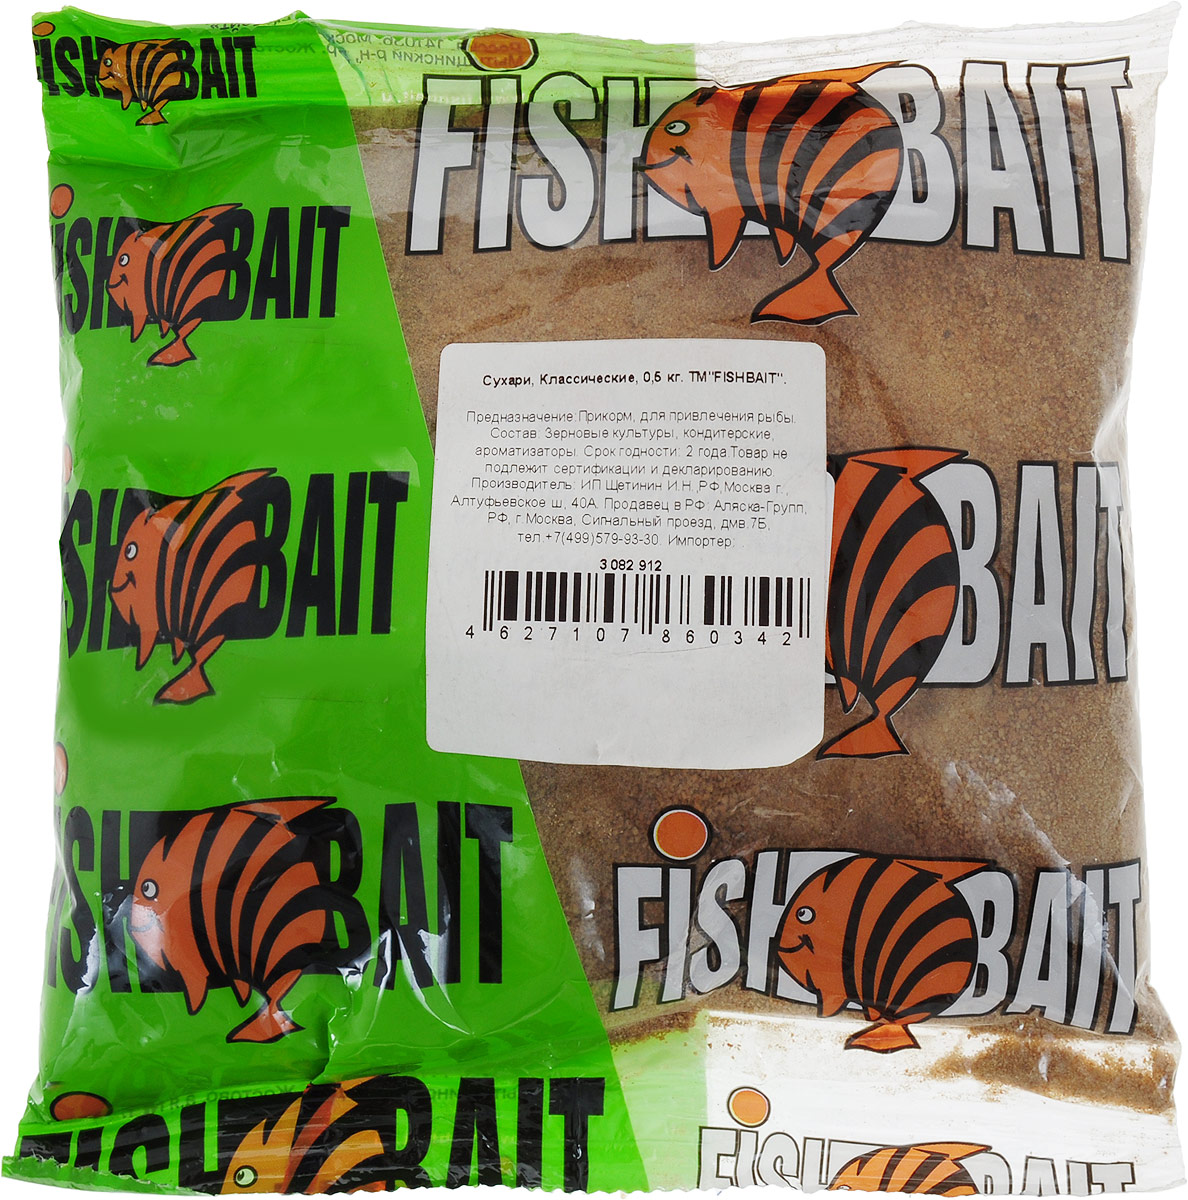 Сухари для прикормки FishBait Классические, 0,5 кг